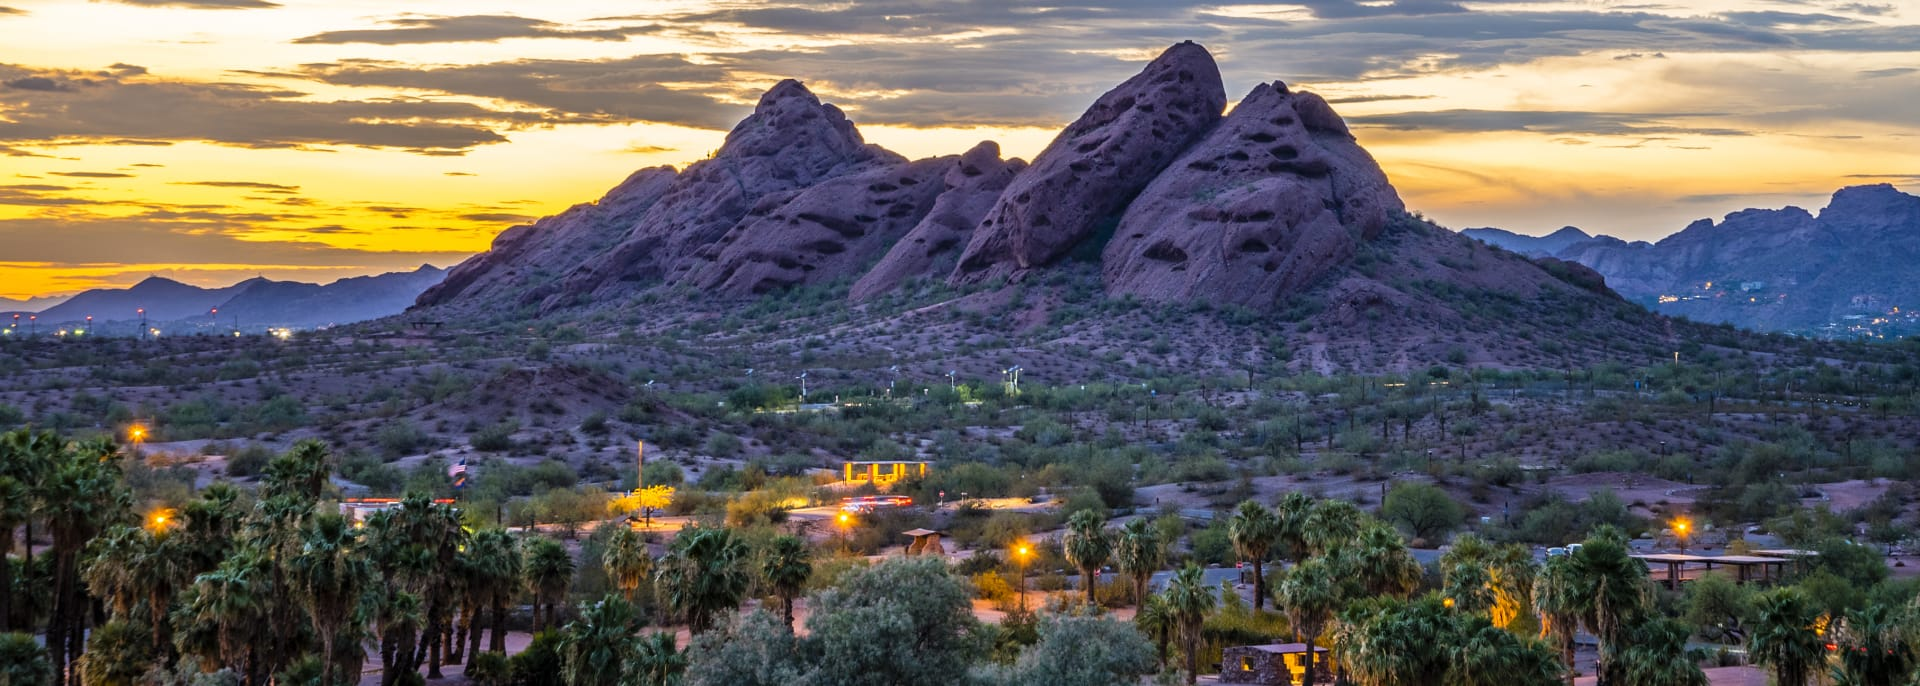 Phoenix Reisen, USA